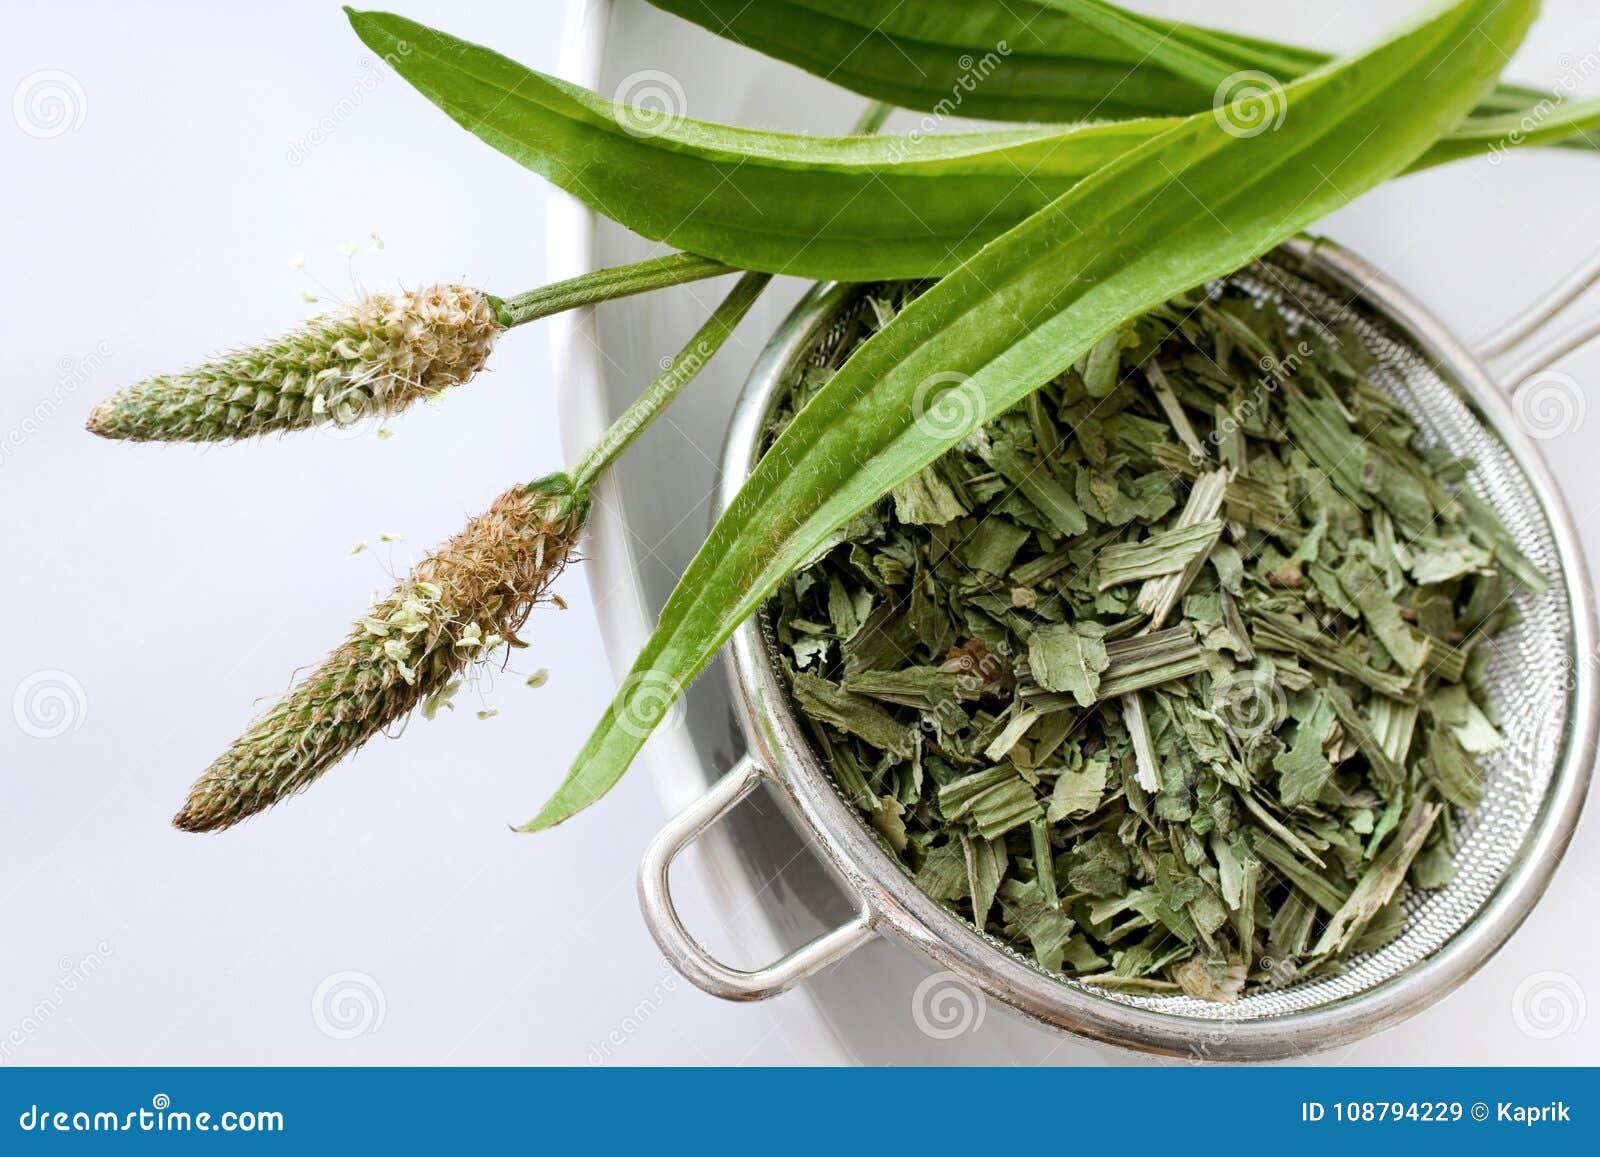 Homemade remedy - herbal plantain tea plantago lanceolata - he